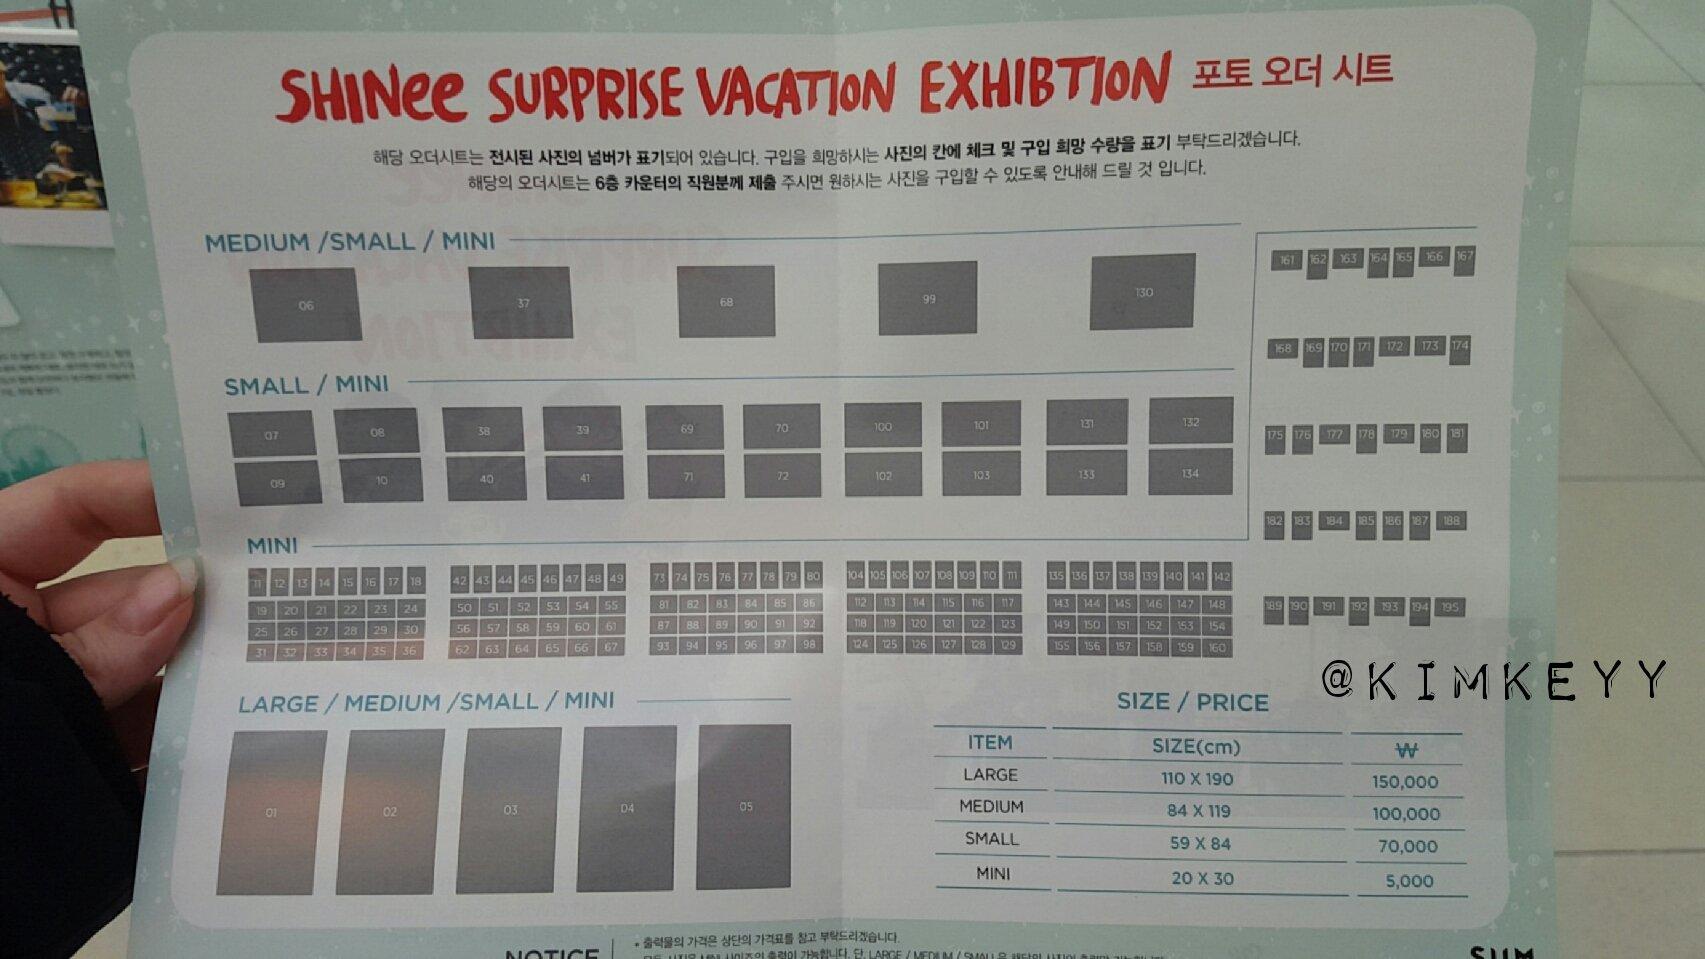 SHINee @ SHINee Surprise Vacation Exhibition 24943215659_3c5d39baa0_o